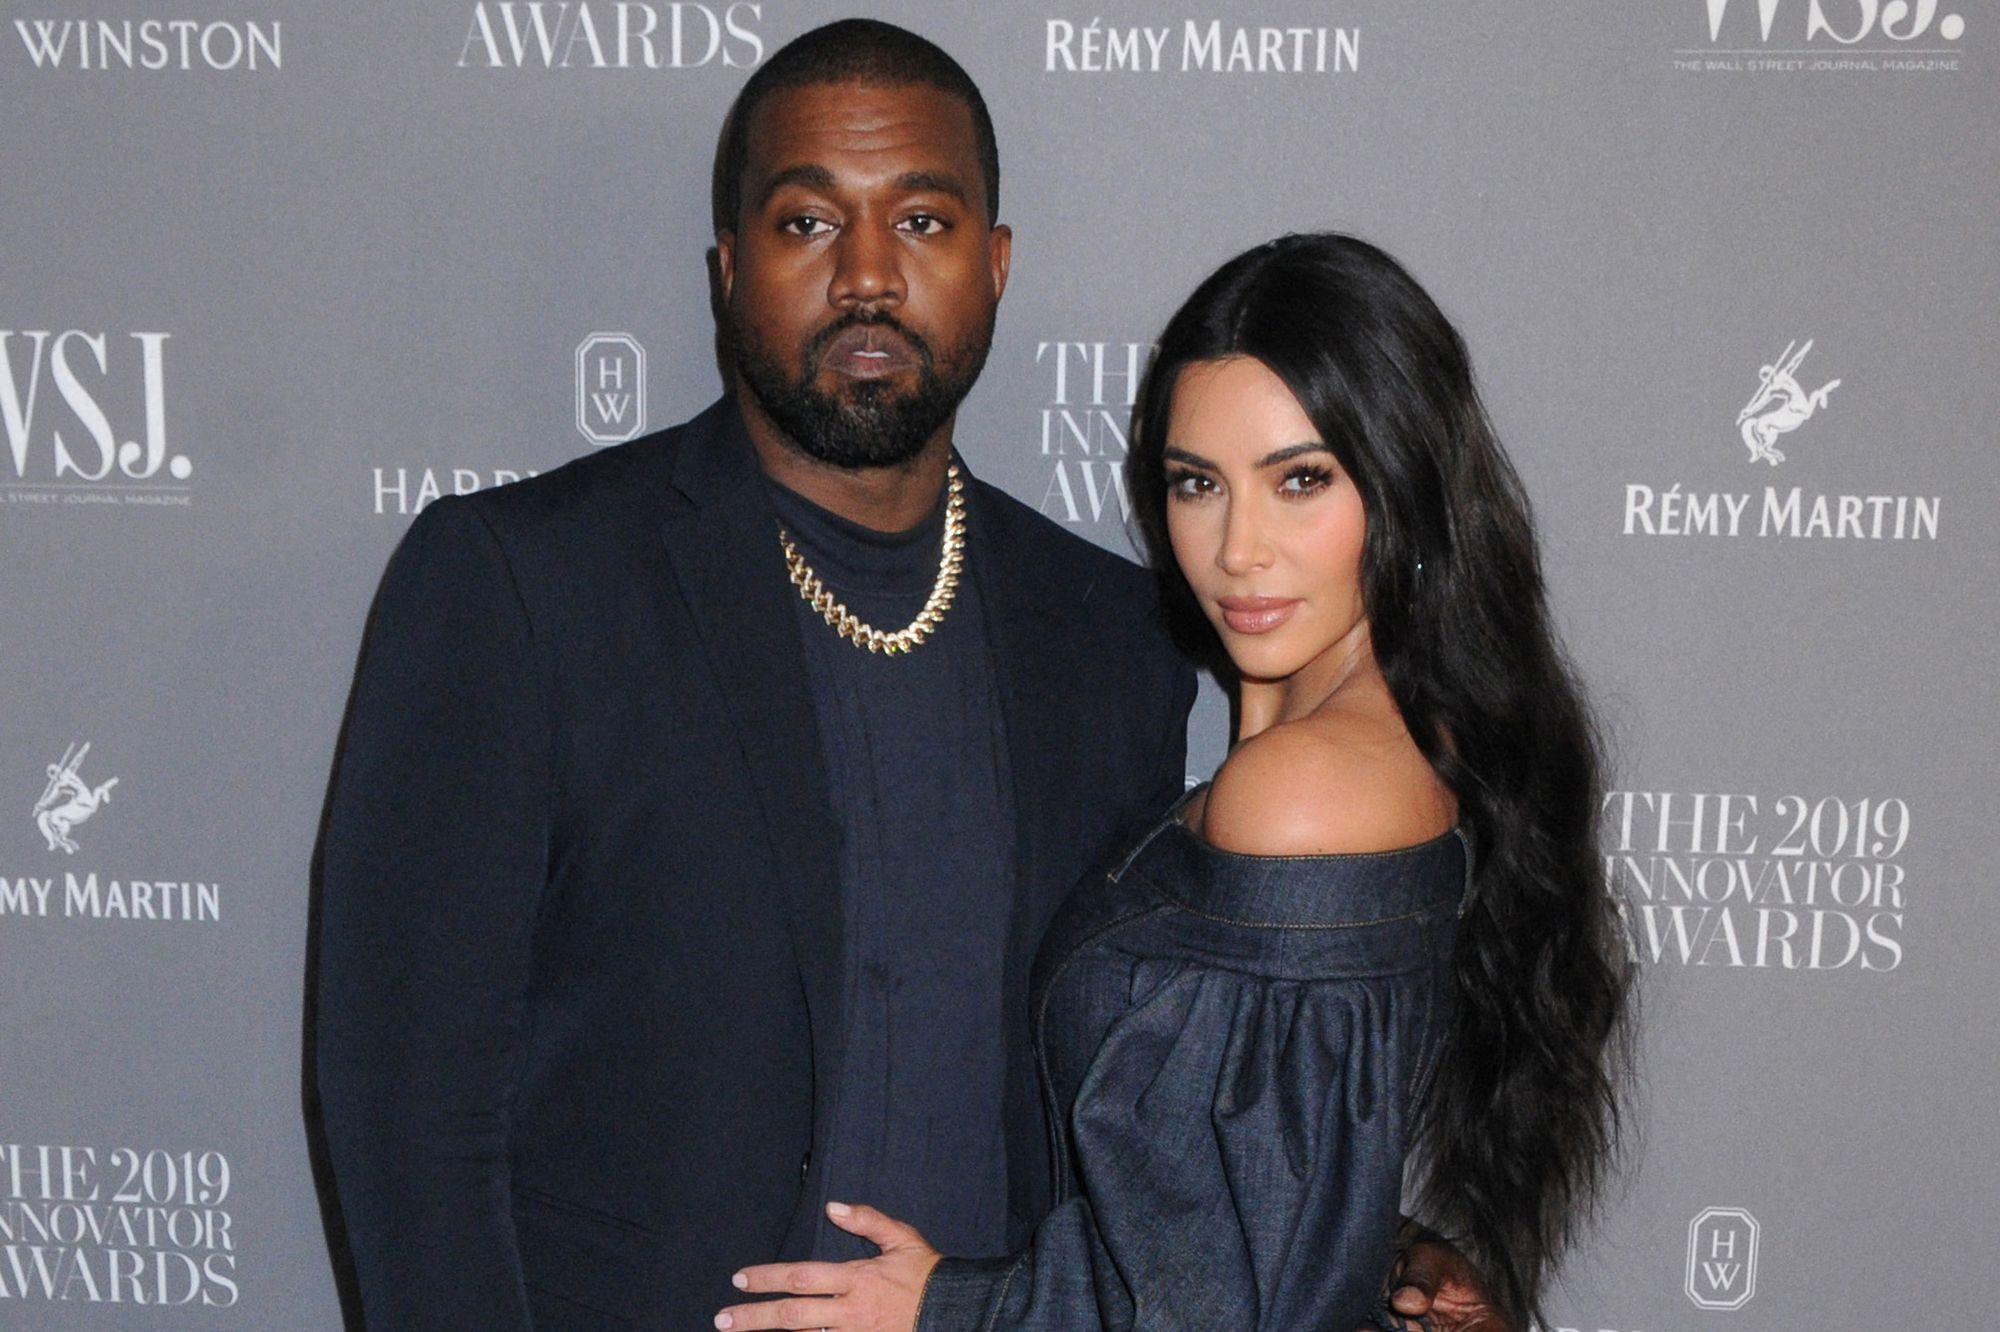 Kim Kardashian va-t-elle craquer et divorcer de Kanye West ?